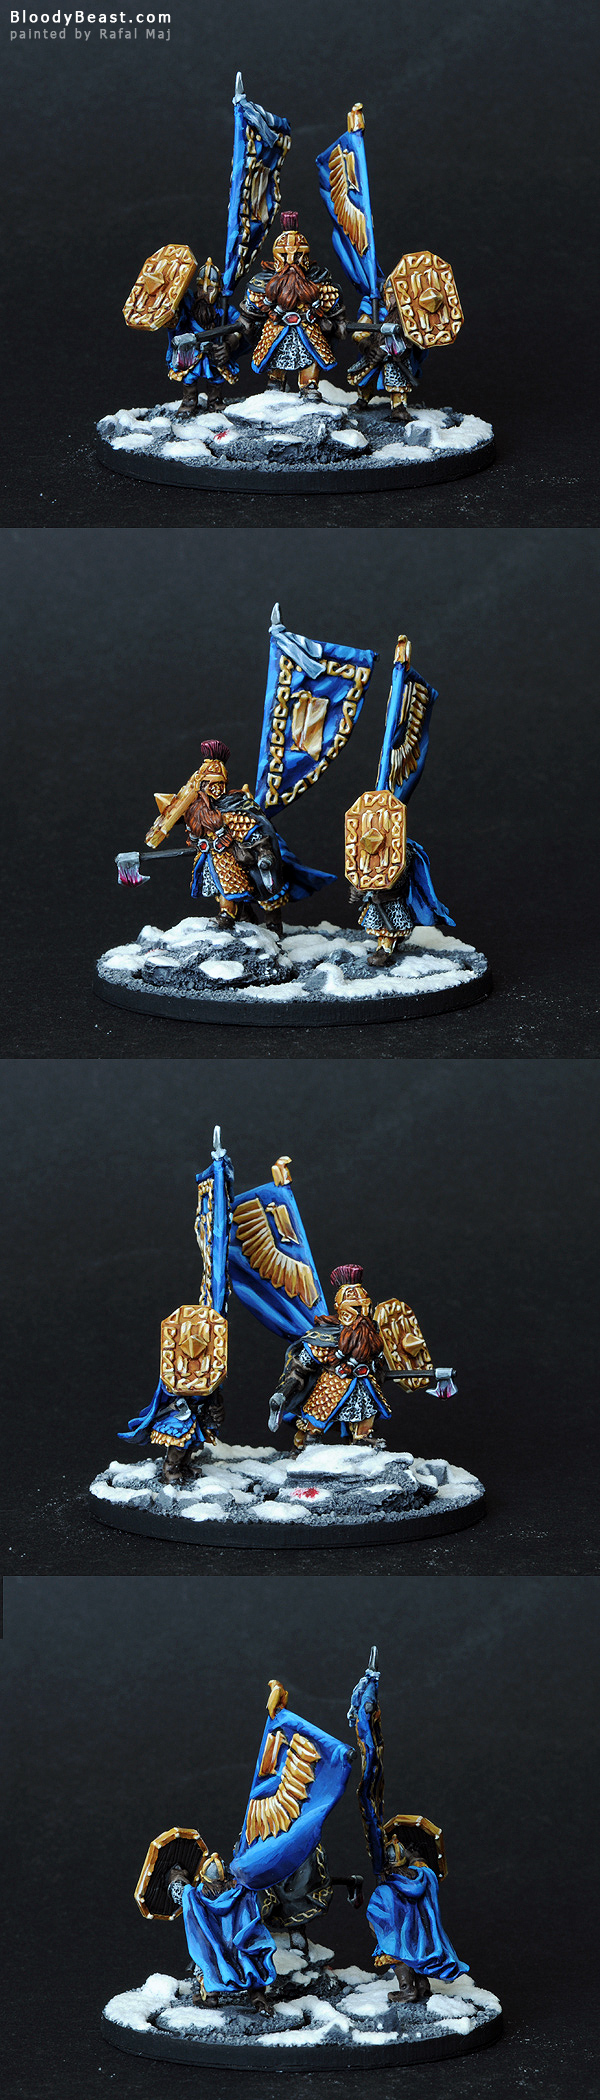 King's Champion painted by Rafal Maj (BloodyBeast.com)